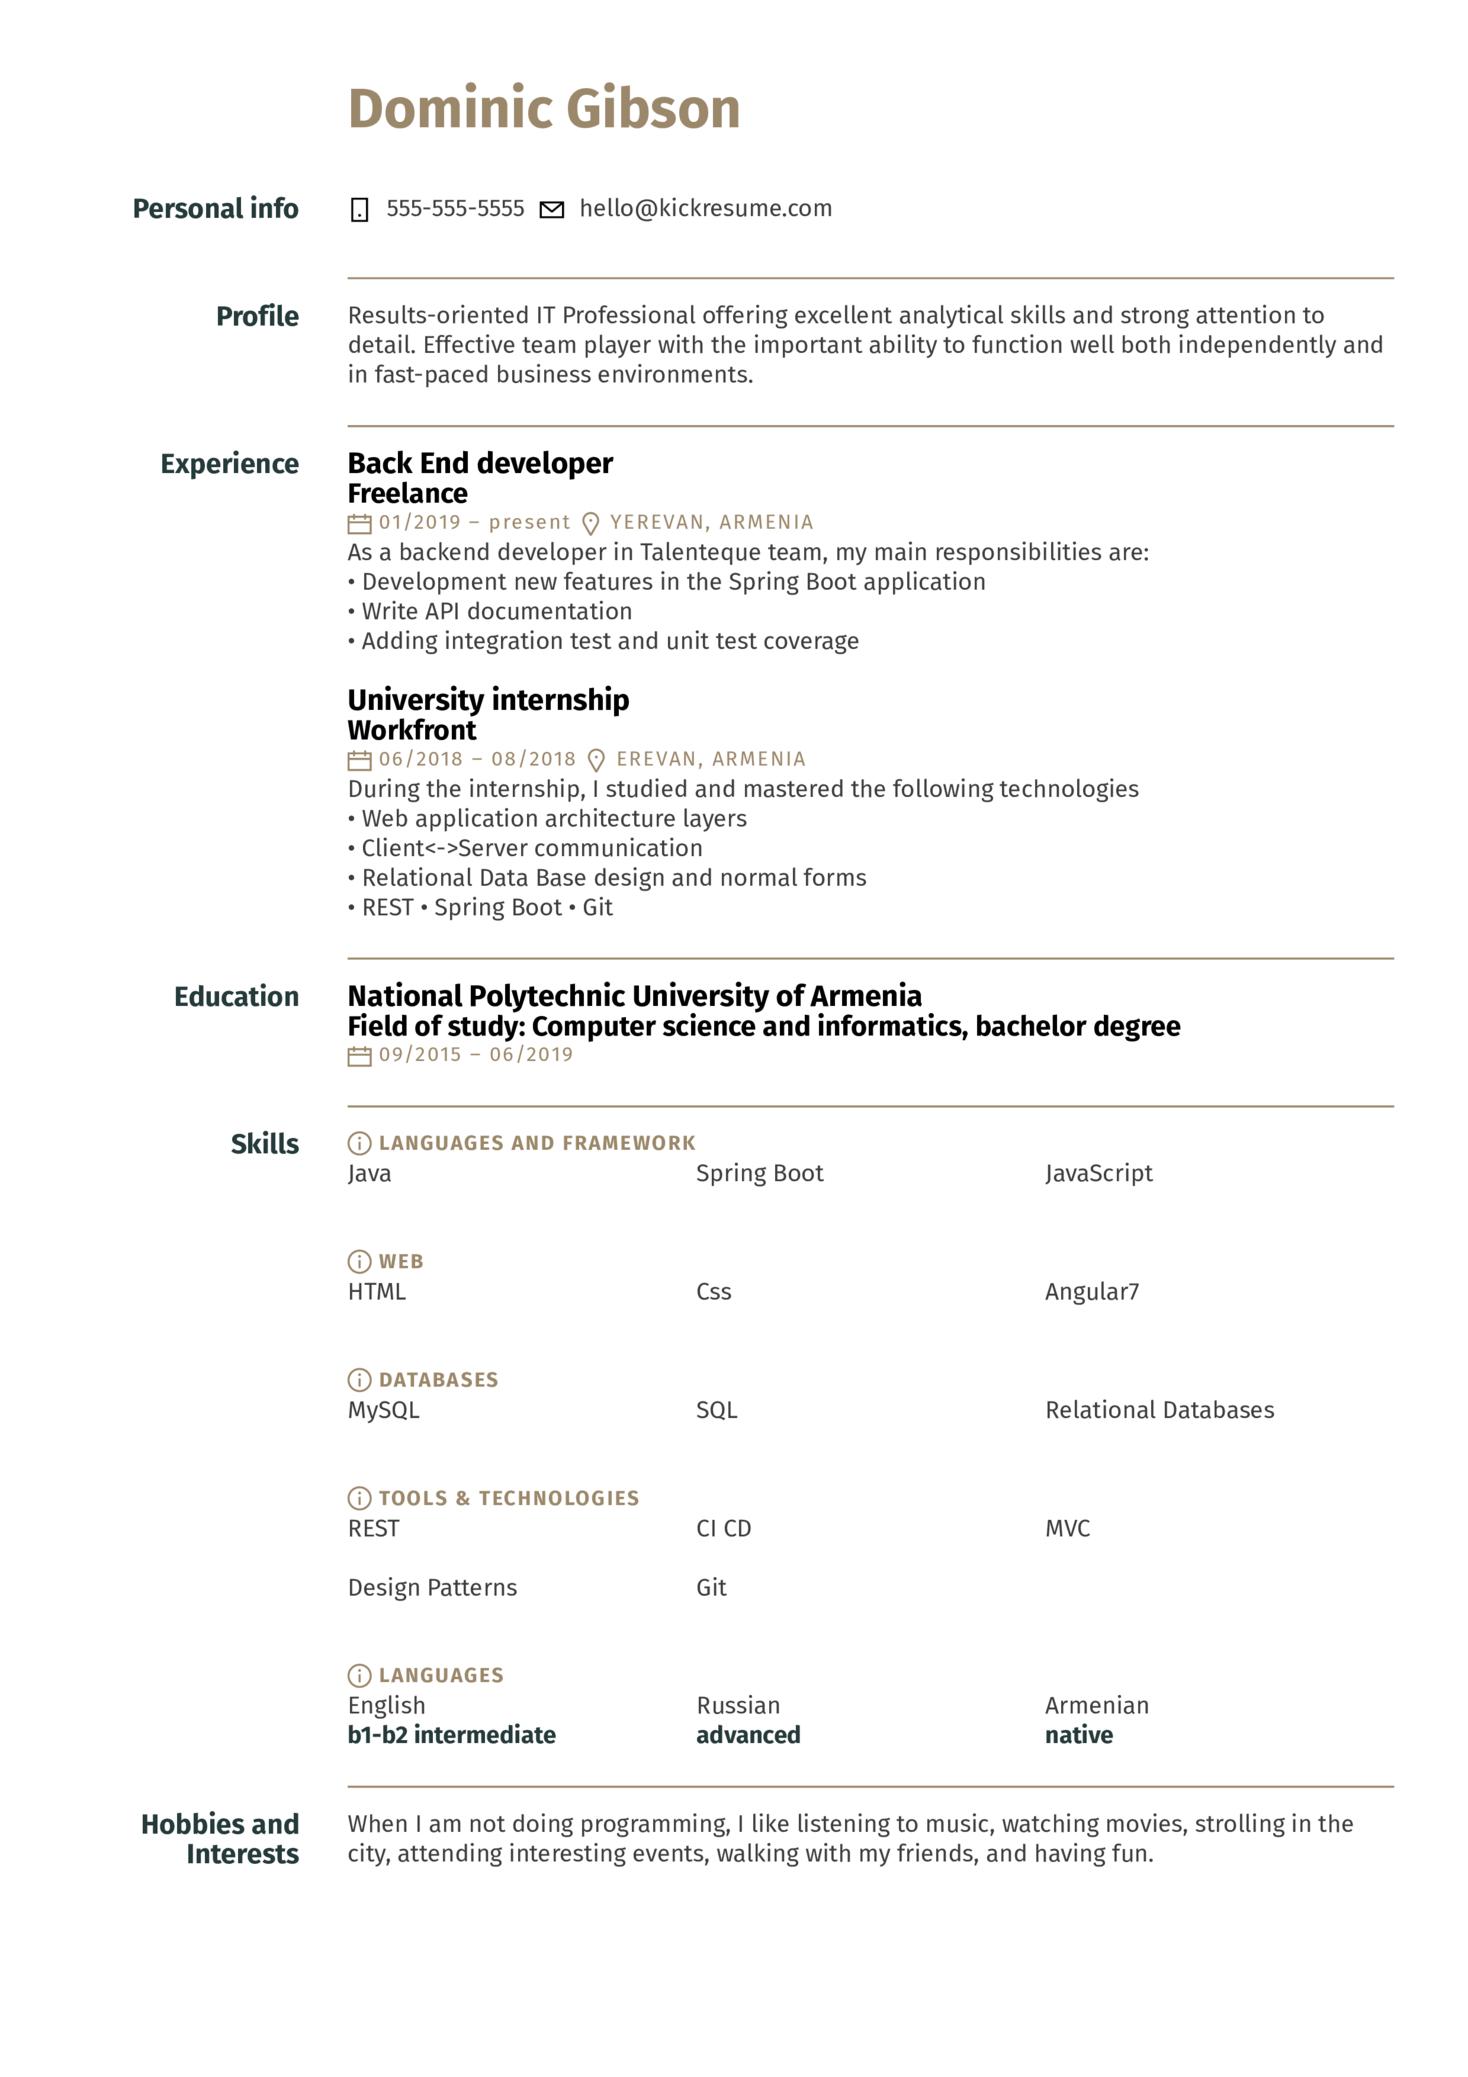 Workfront Full Stack Intern Resume Example